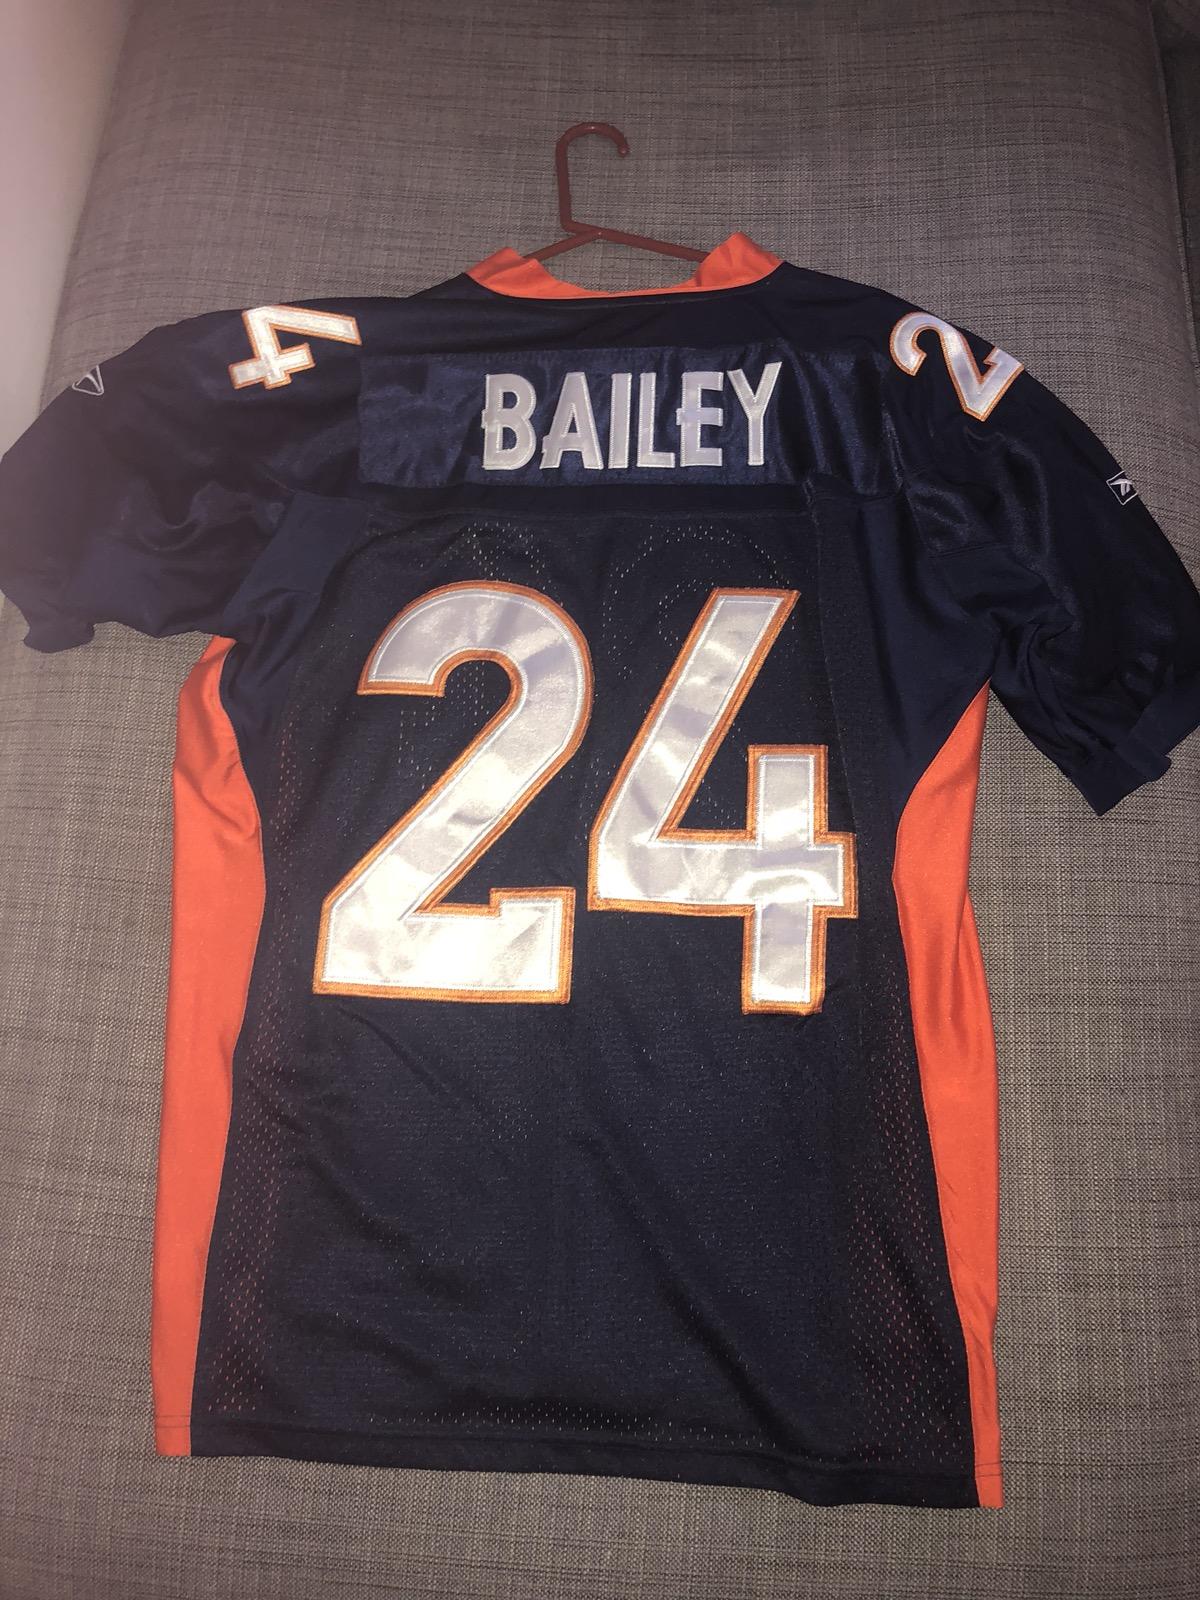 reputable site fb5de c9cdd Champ Bailey Broncos Jersey